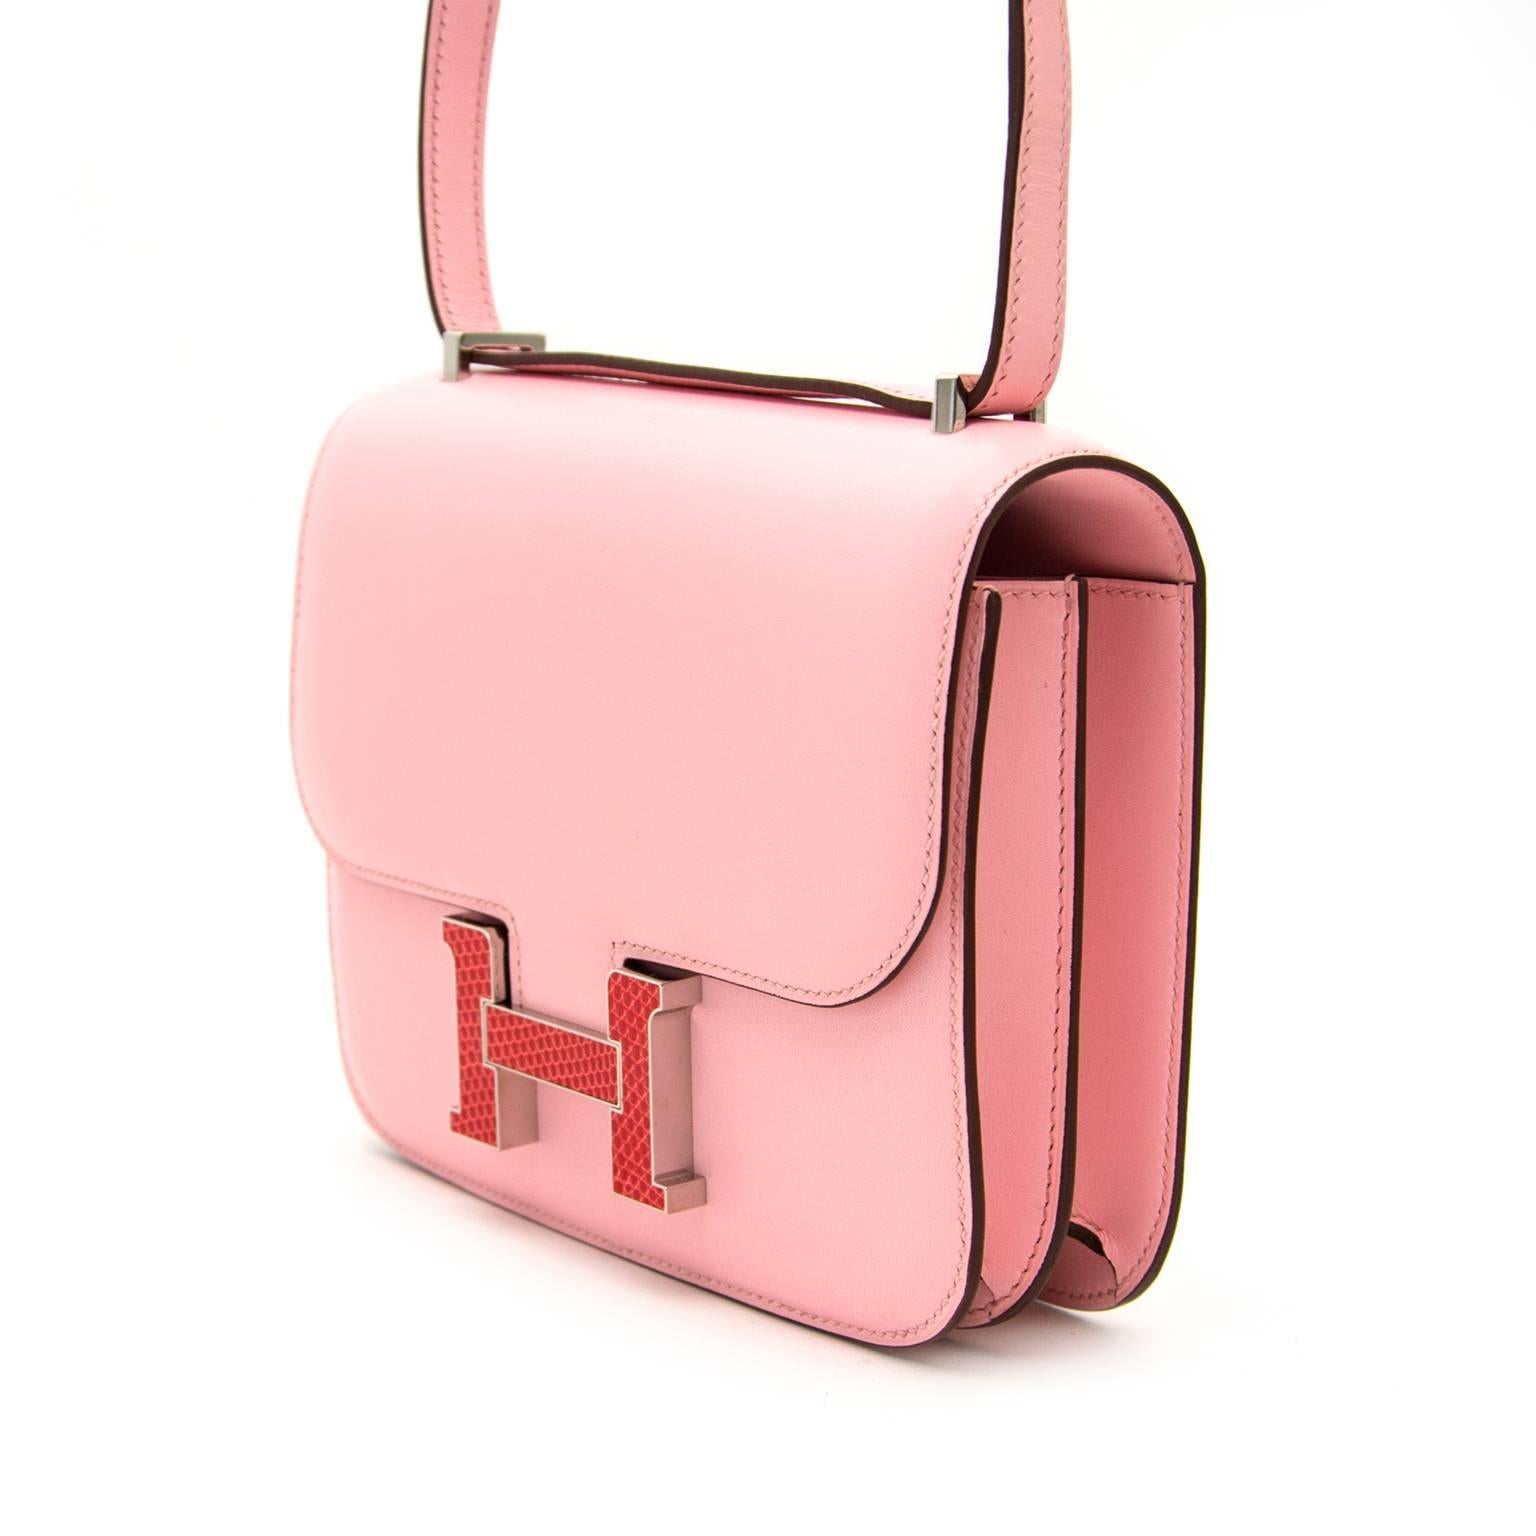 8f4a23be8673 Very Rare and New Hermès Constance 18cm Rose Sakura lezard   tadelakt at  1stdibs